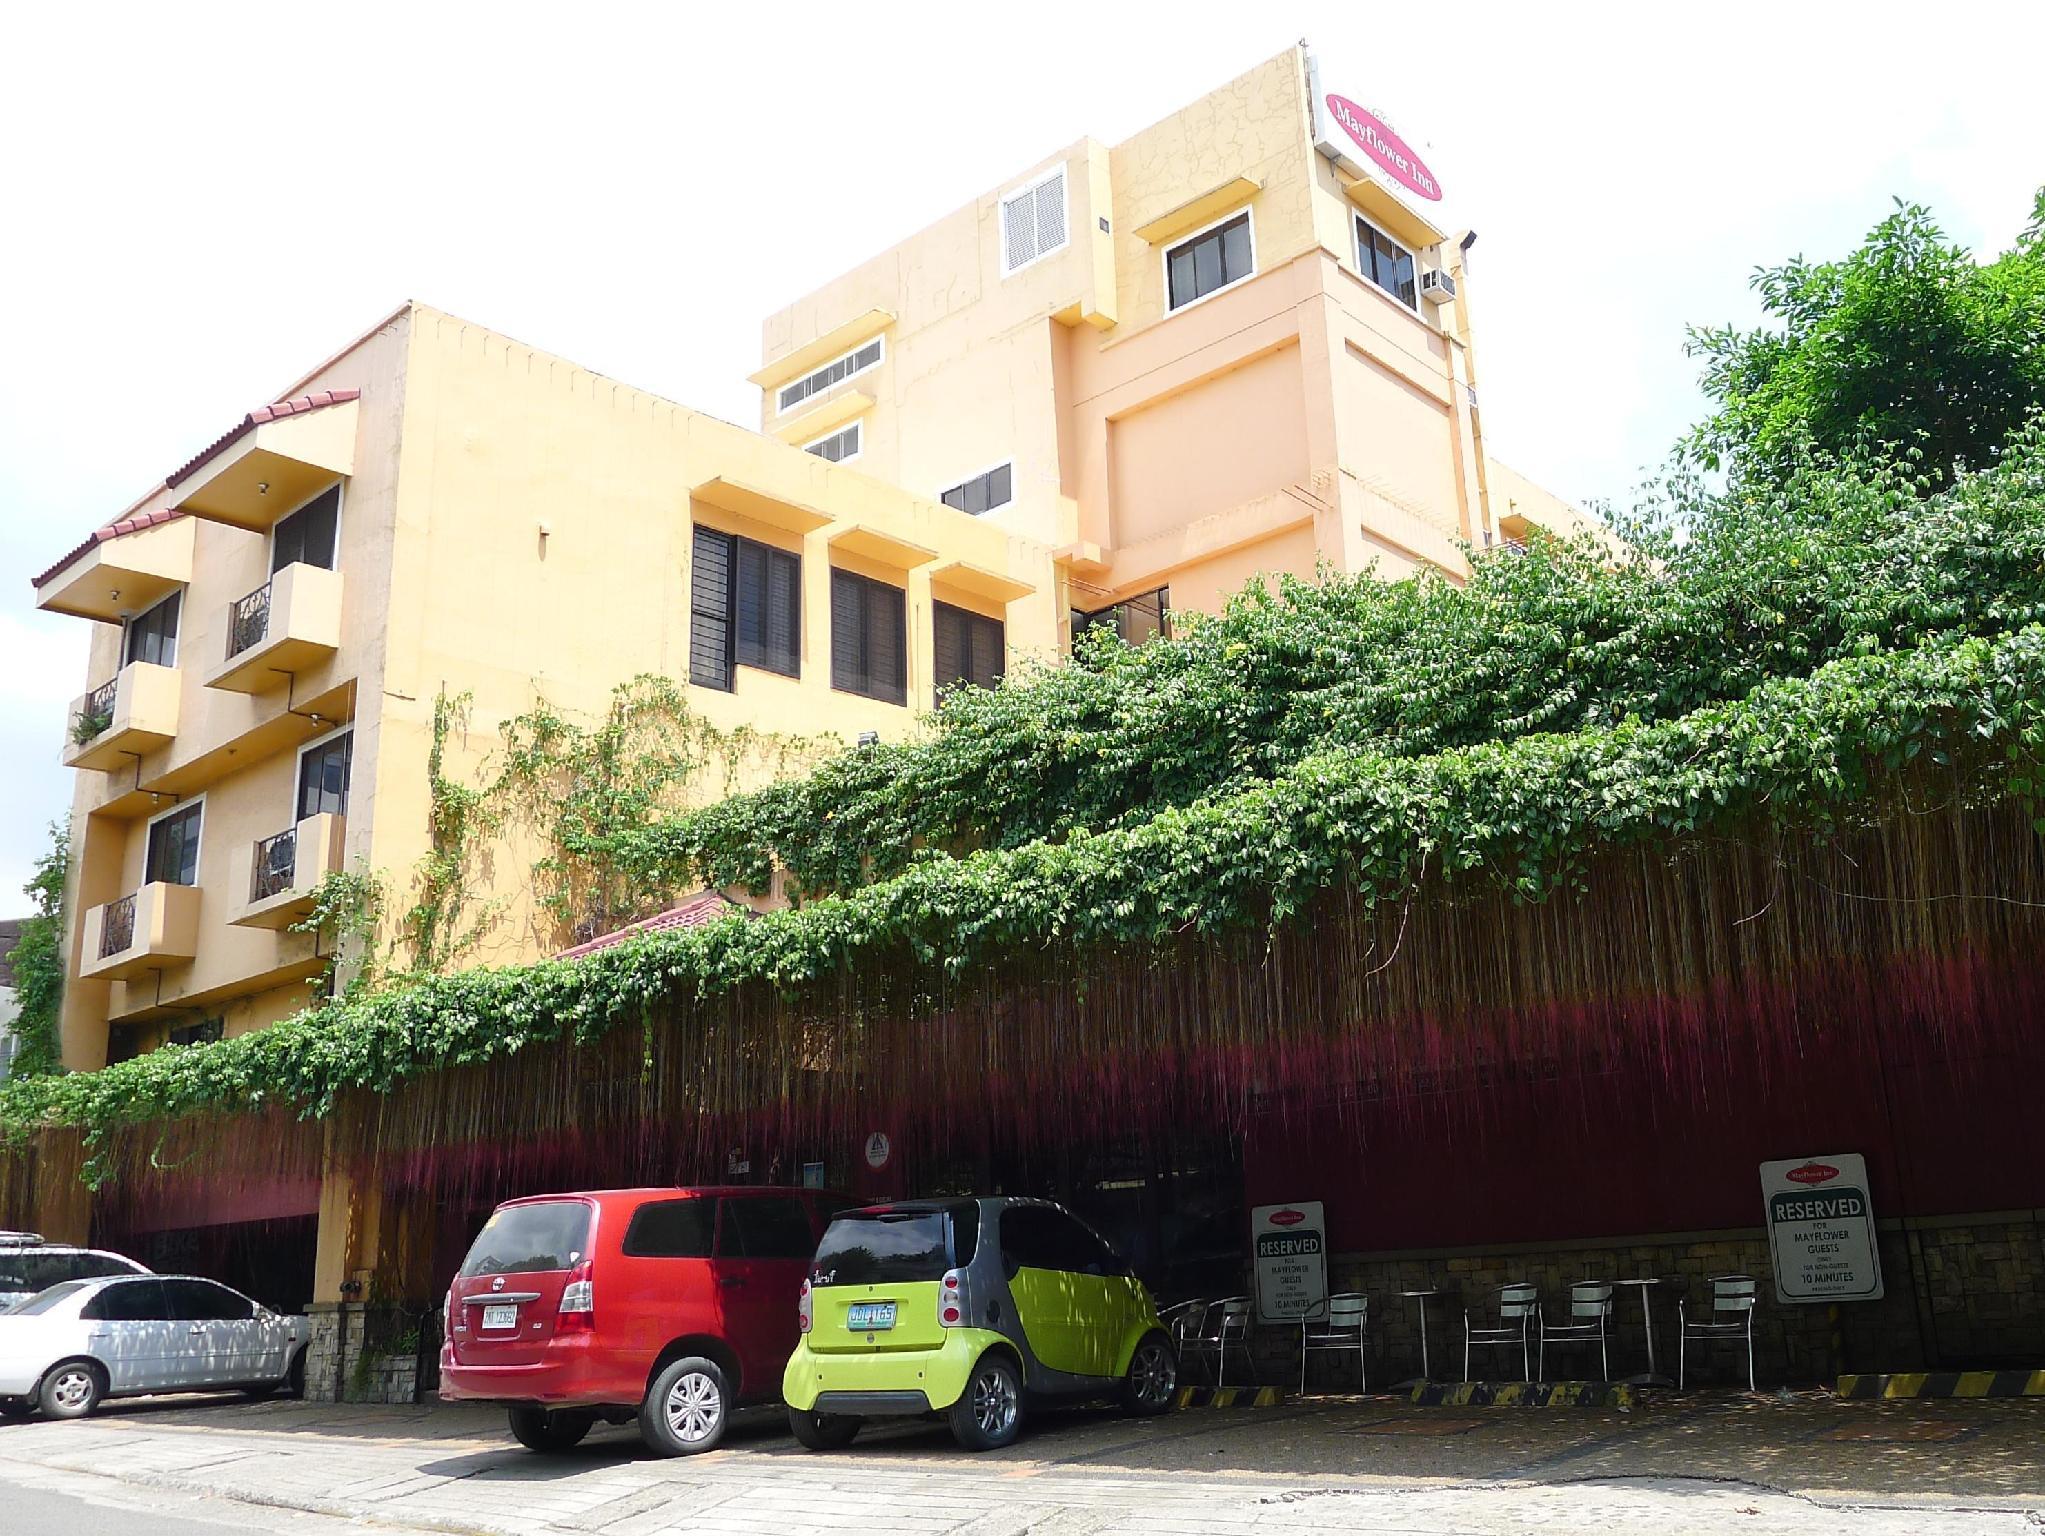 Mayflower Inn Cebu City Cebu Philippines Great Discounted Rates